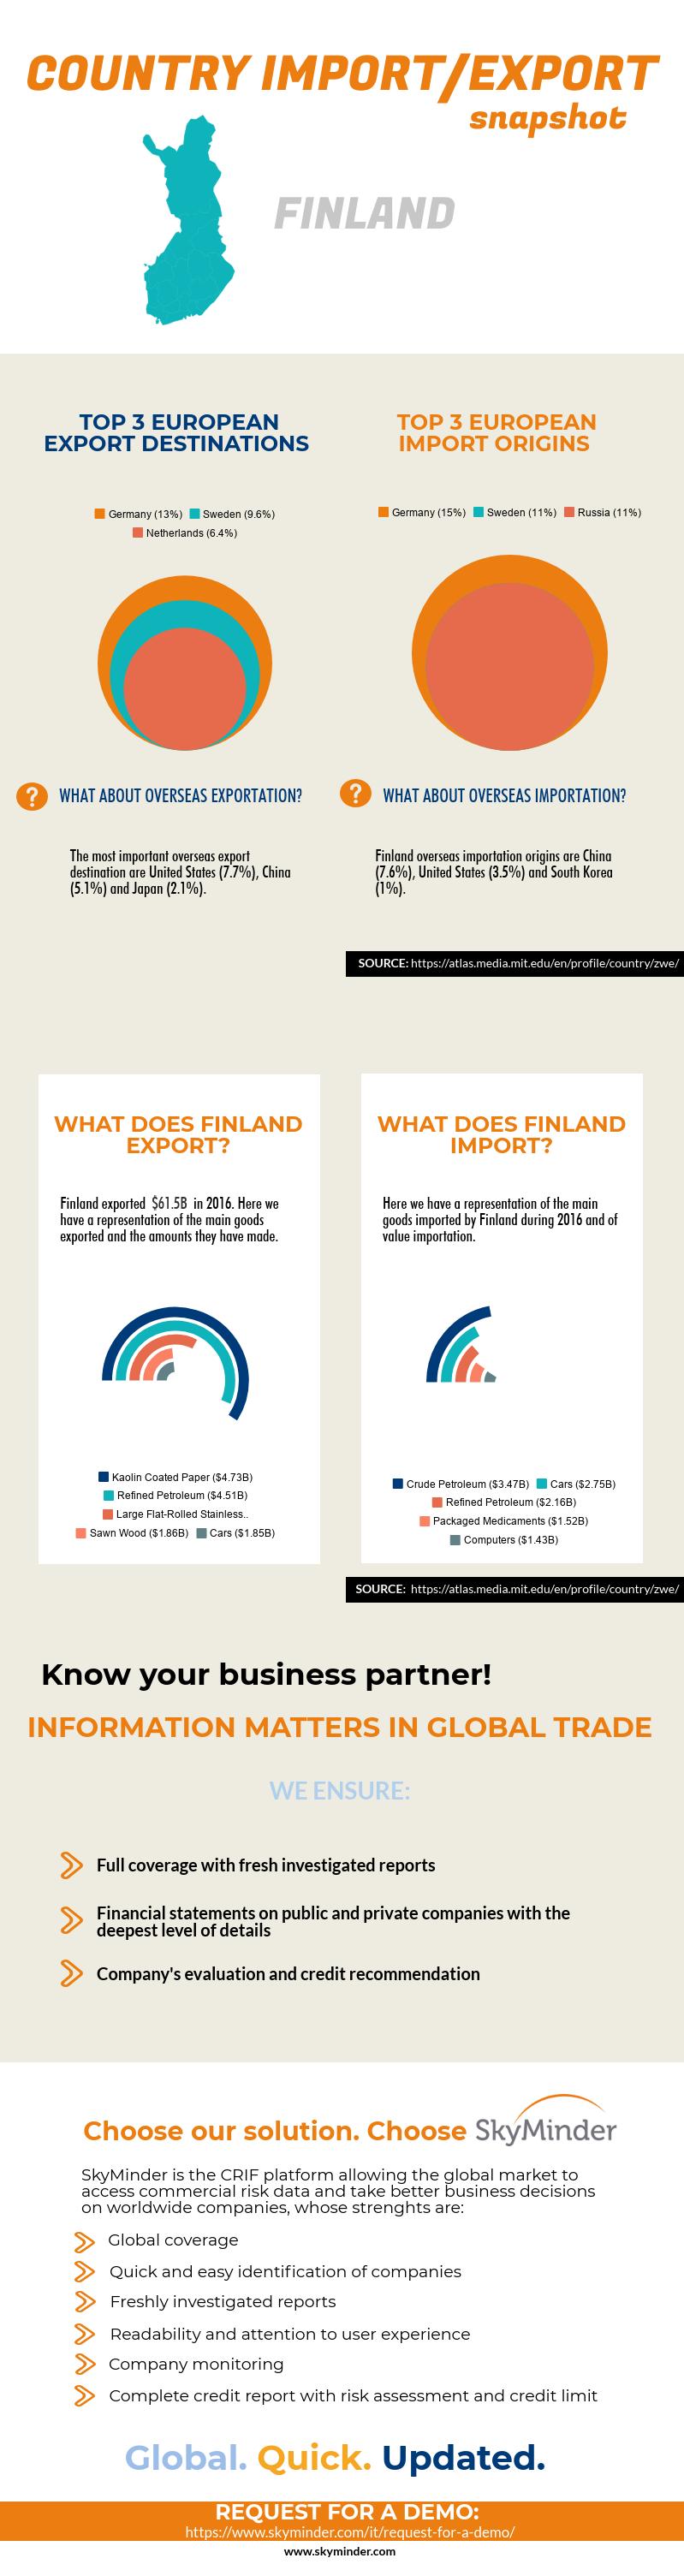 Finnish Import/Export